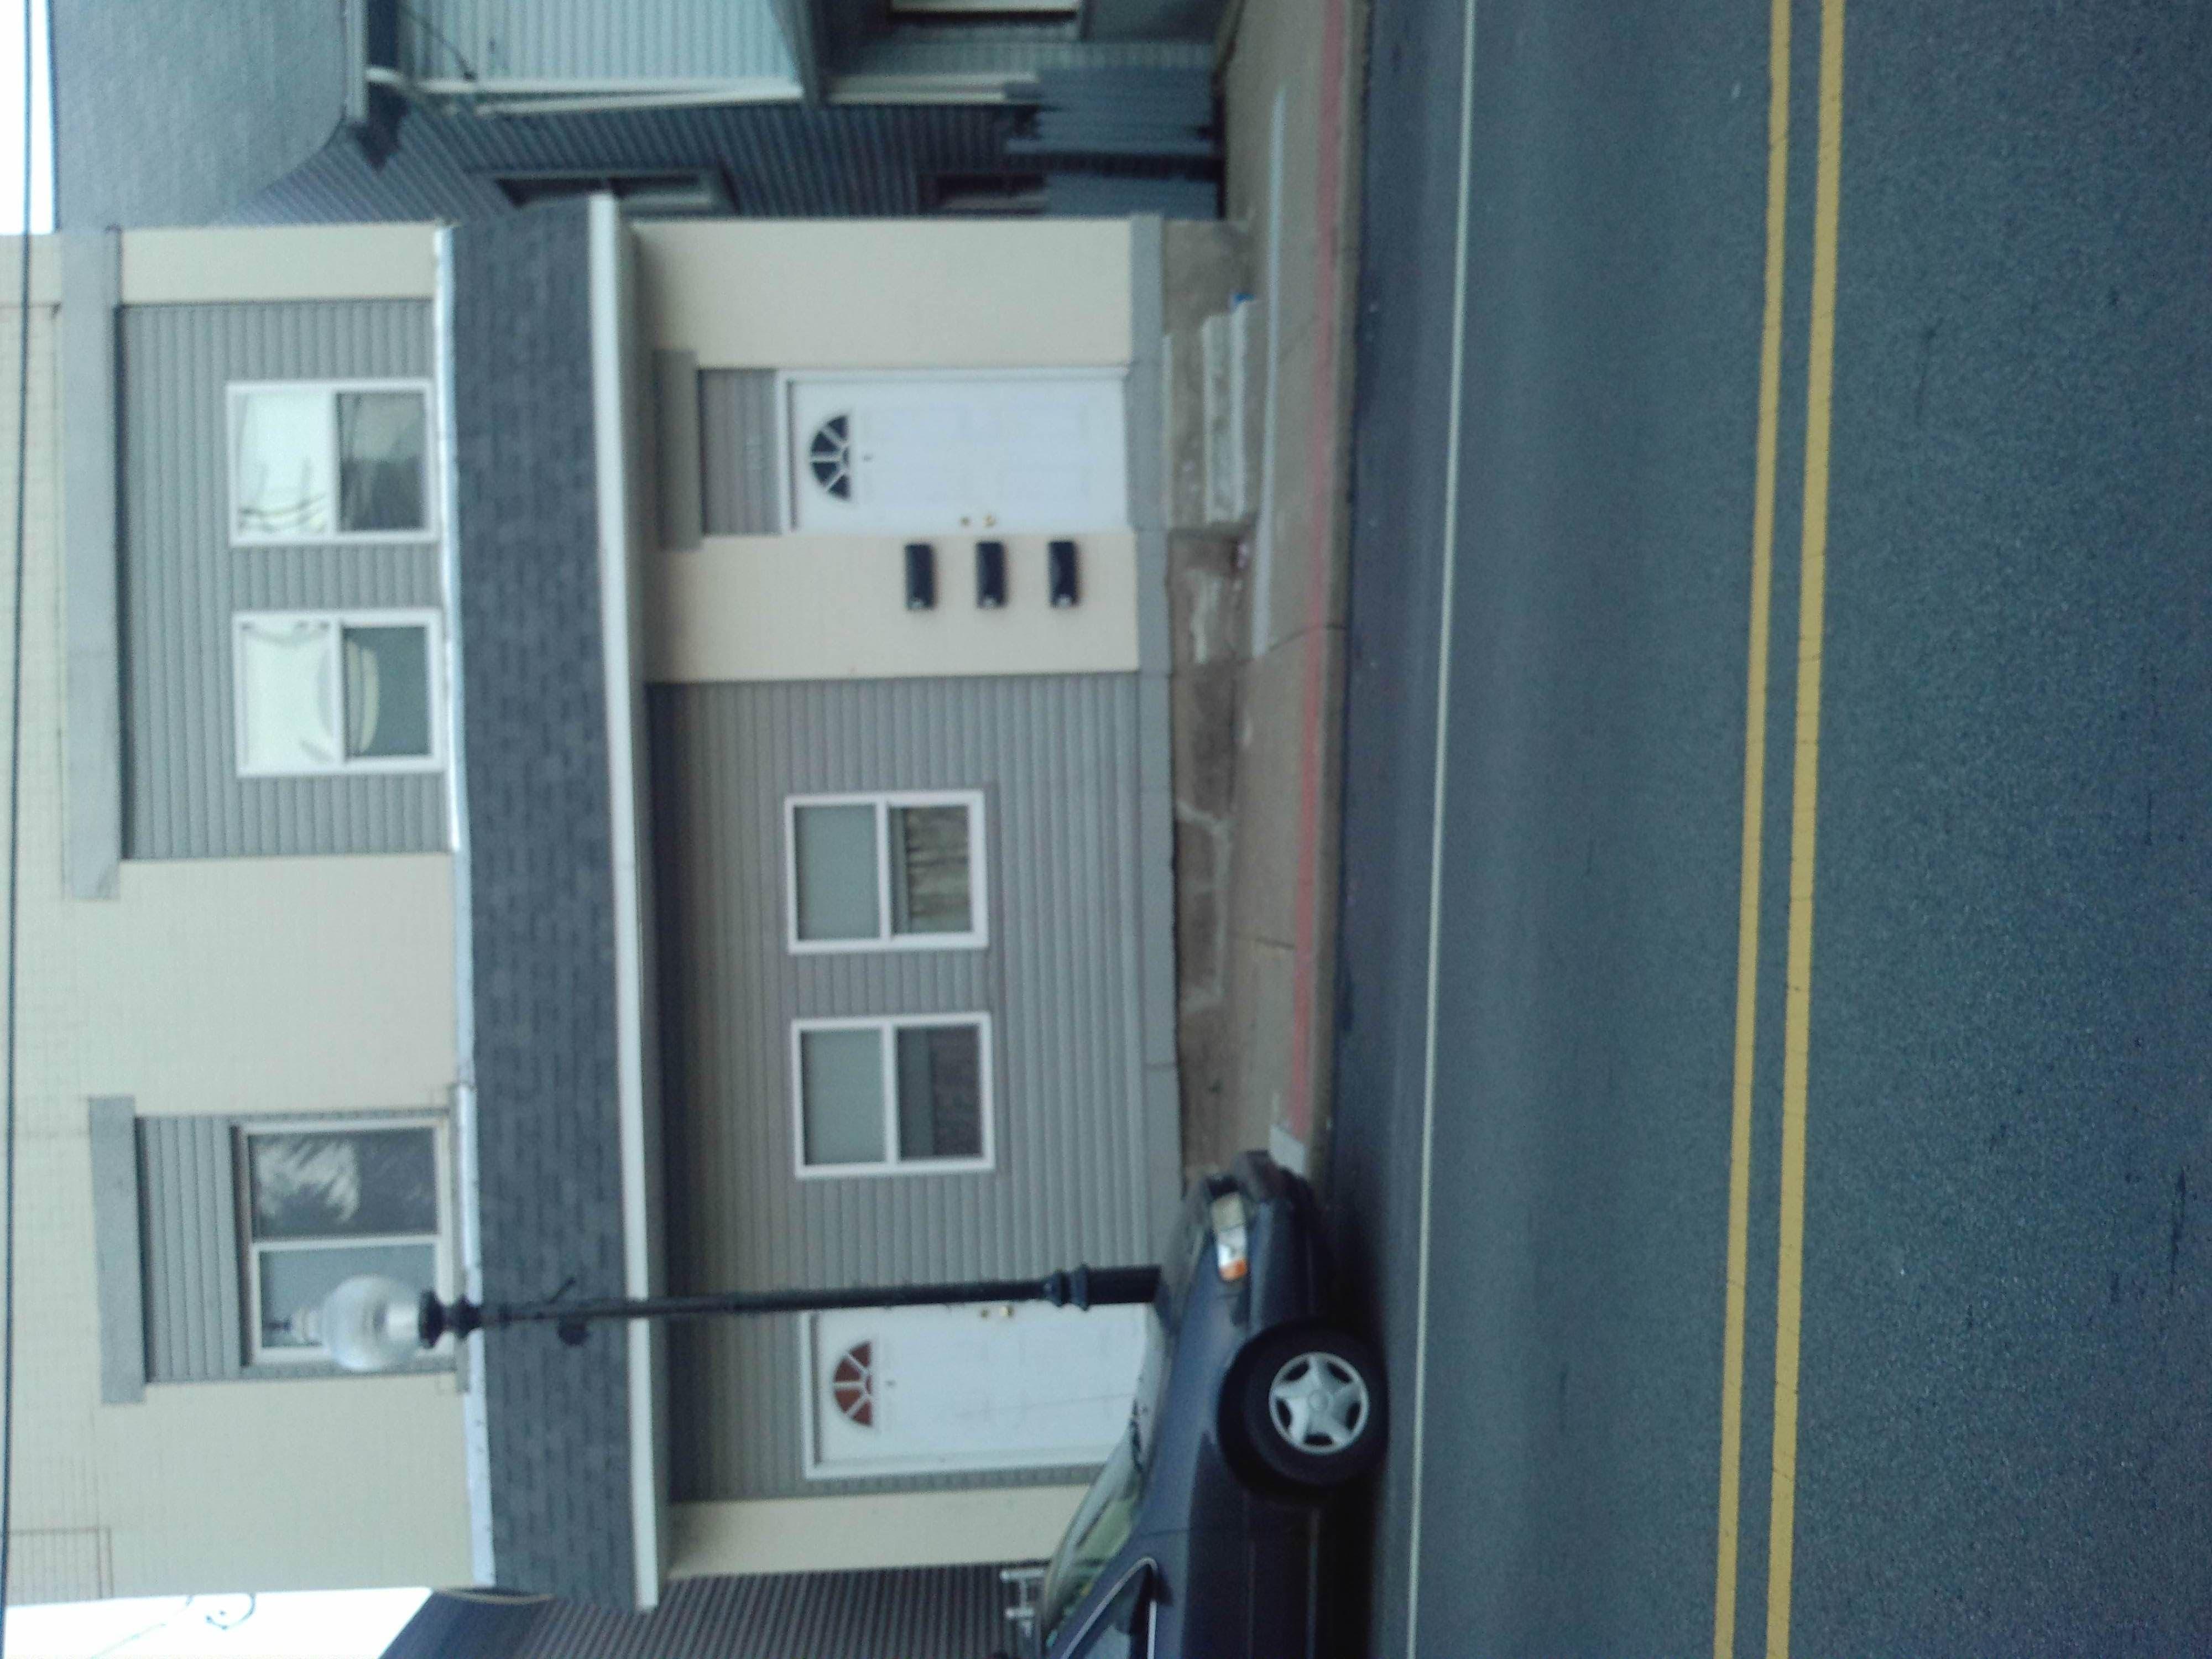 www.mccormick-realestate.com 3 Unit Apartment Building - 401 ...